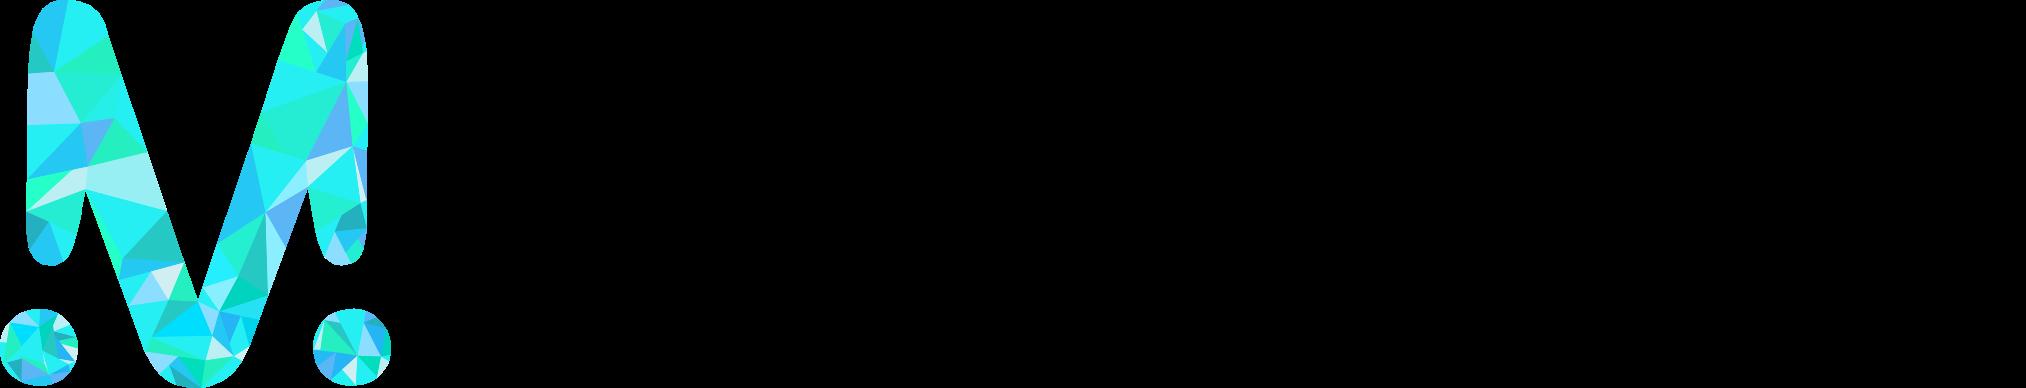 Sotomedia